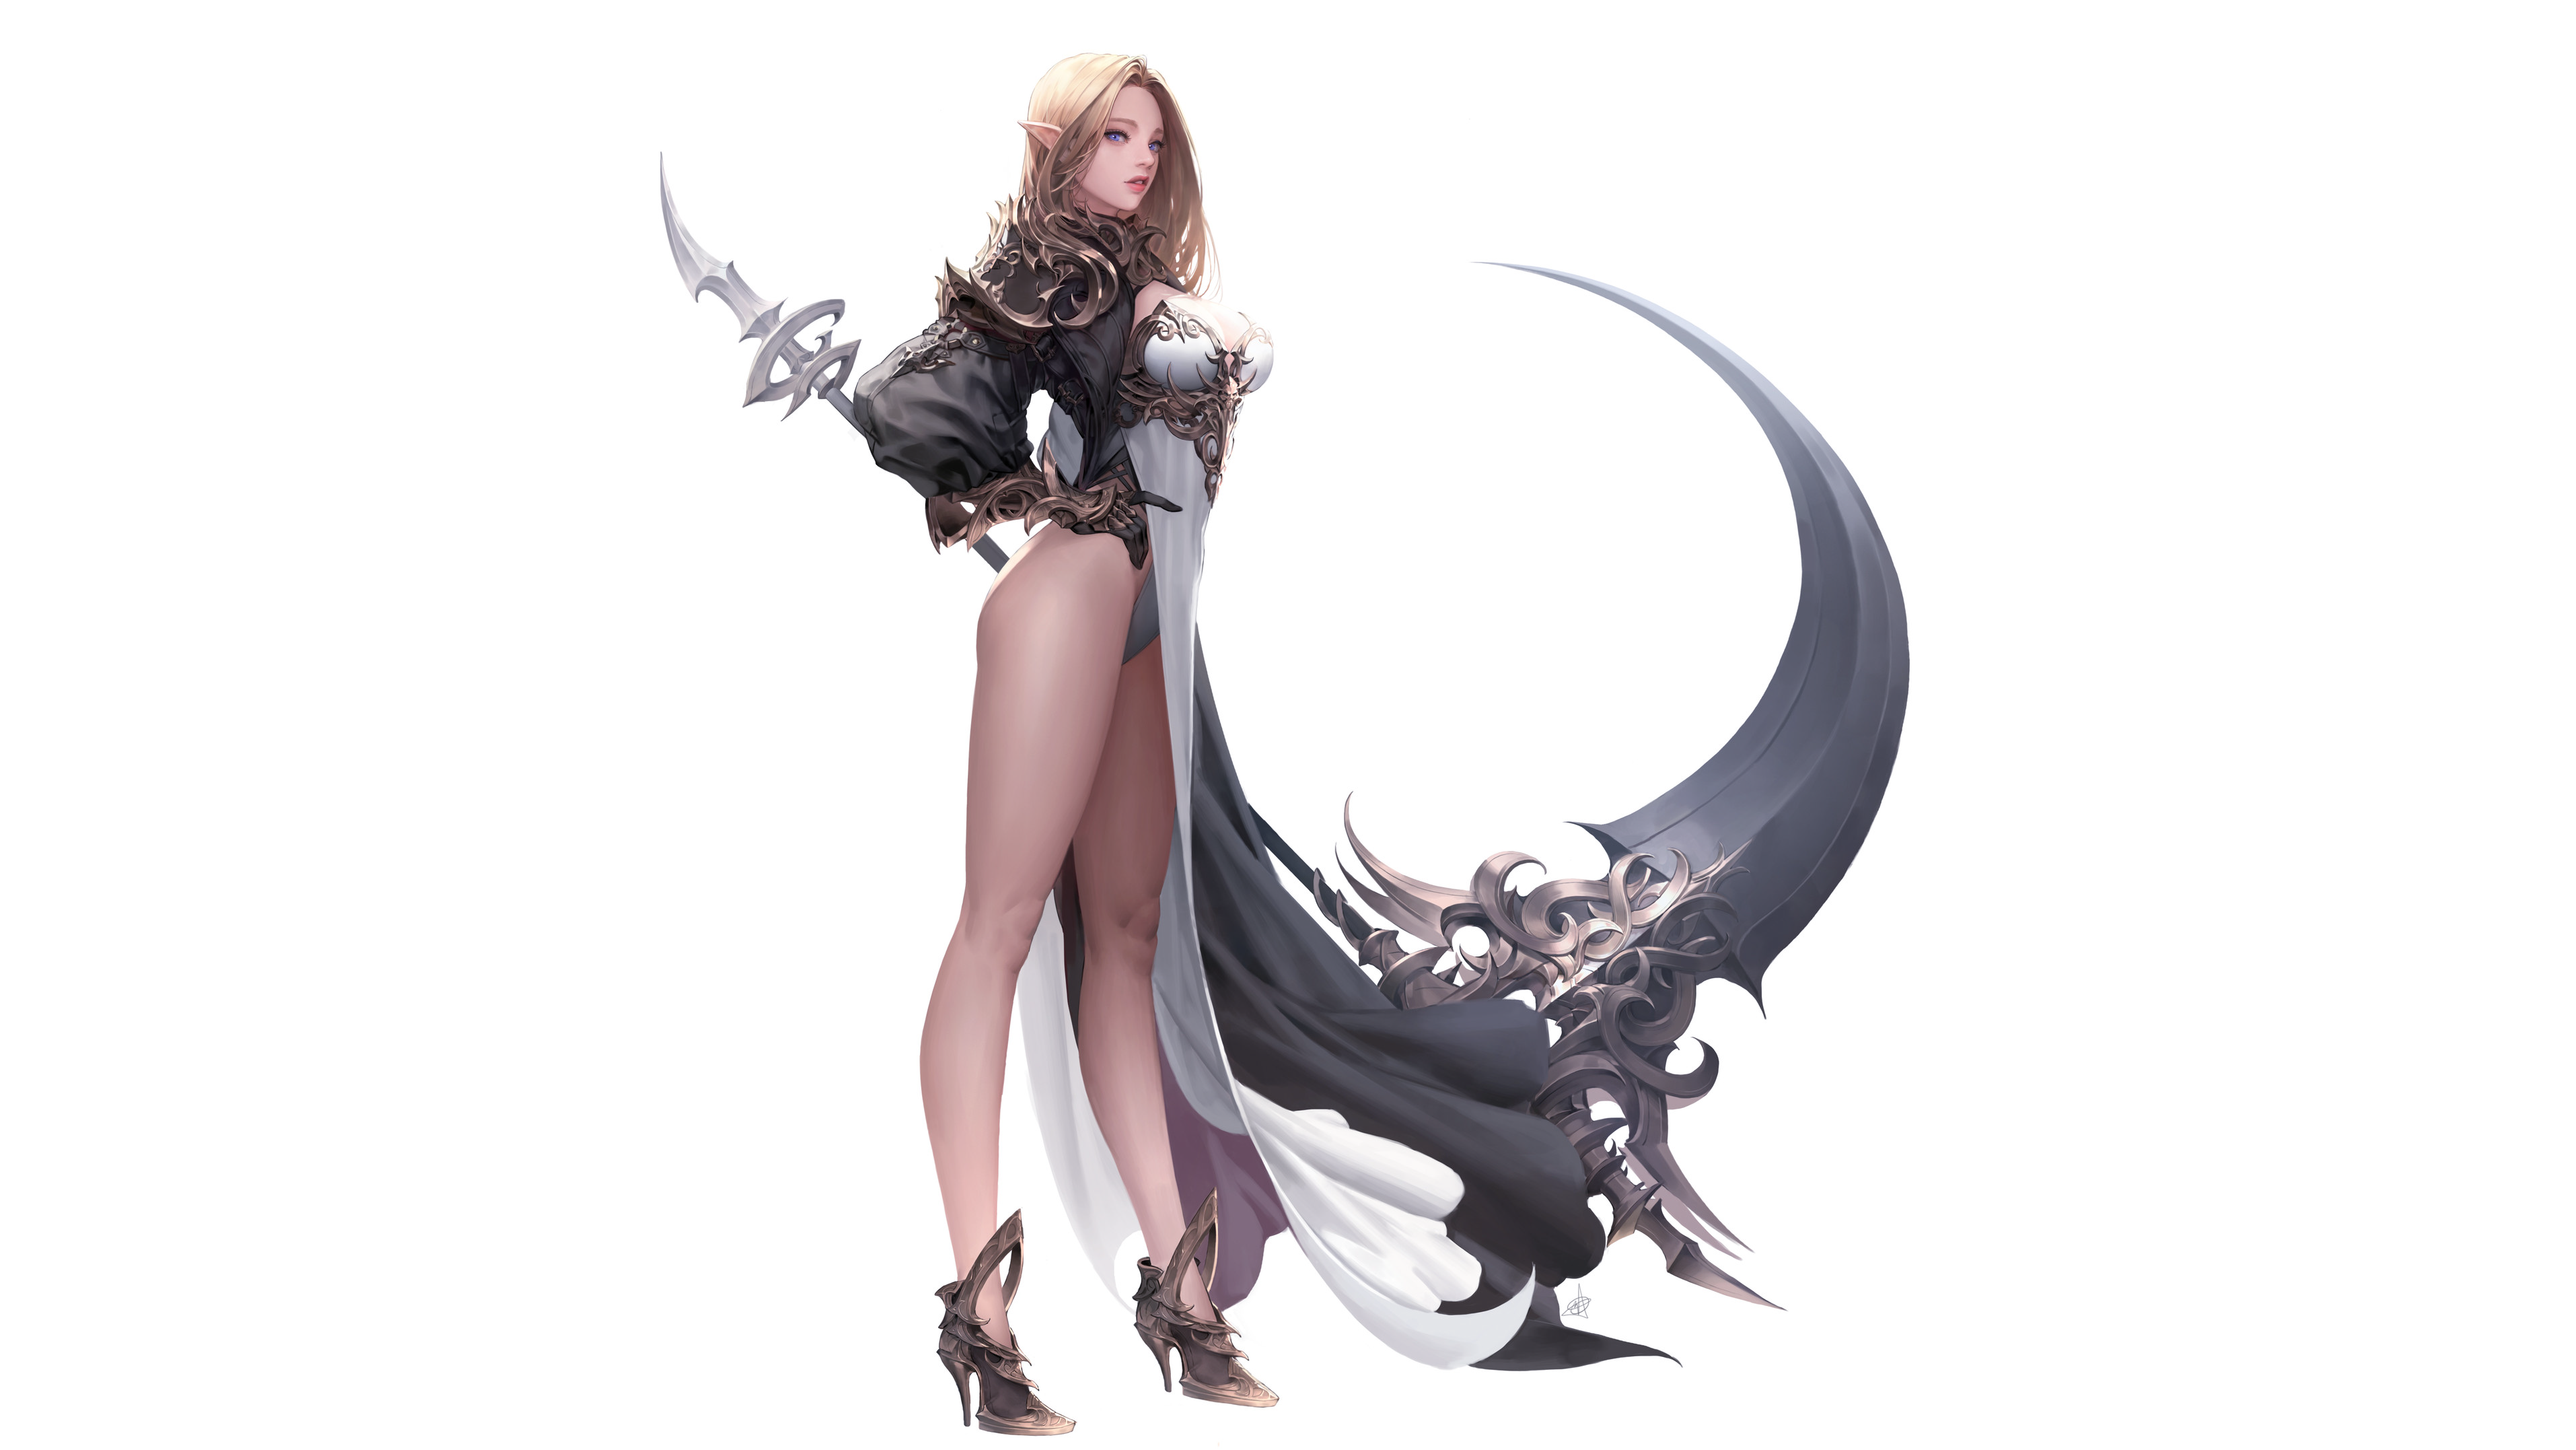 General 3828x2154 digital art women pointy ears armor gauntlets blonde cloaks fantasy weapon scythe high heels standing white  background pointed ears blue eyes Tera online Ake (Cherrylich)